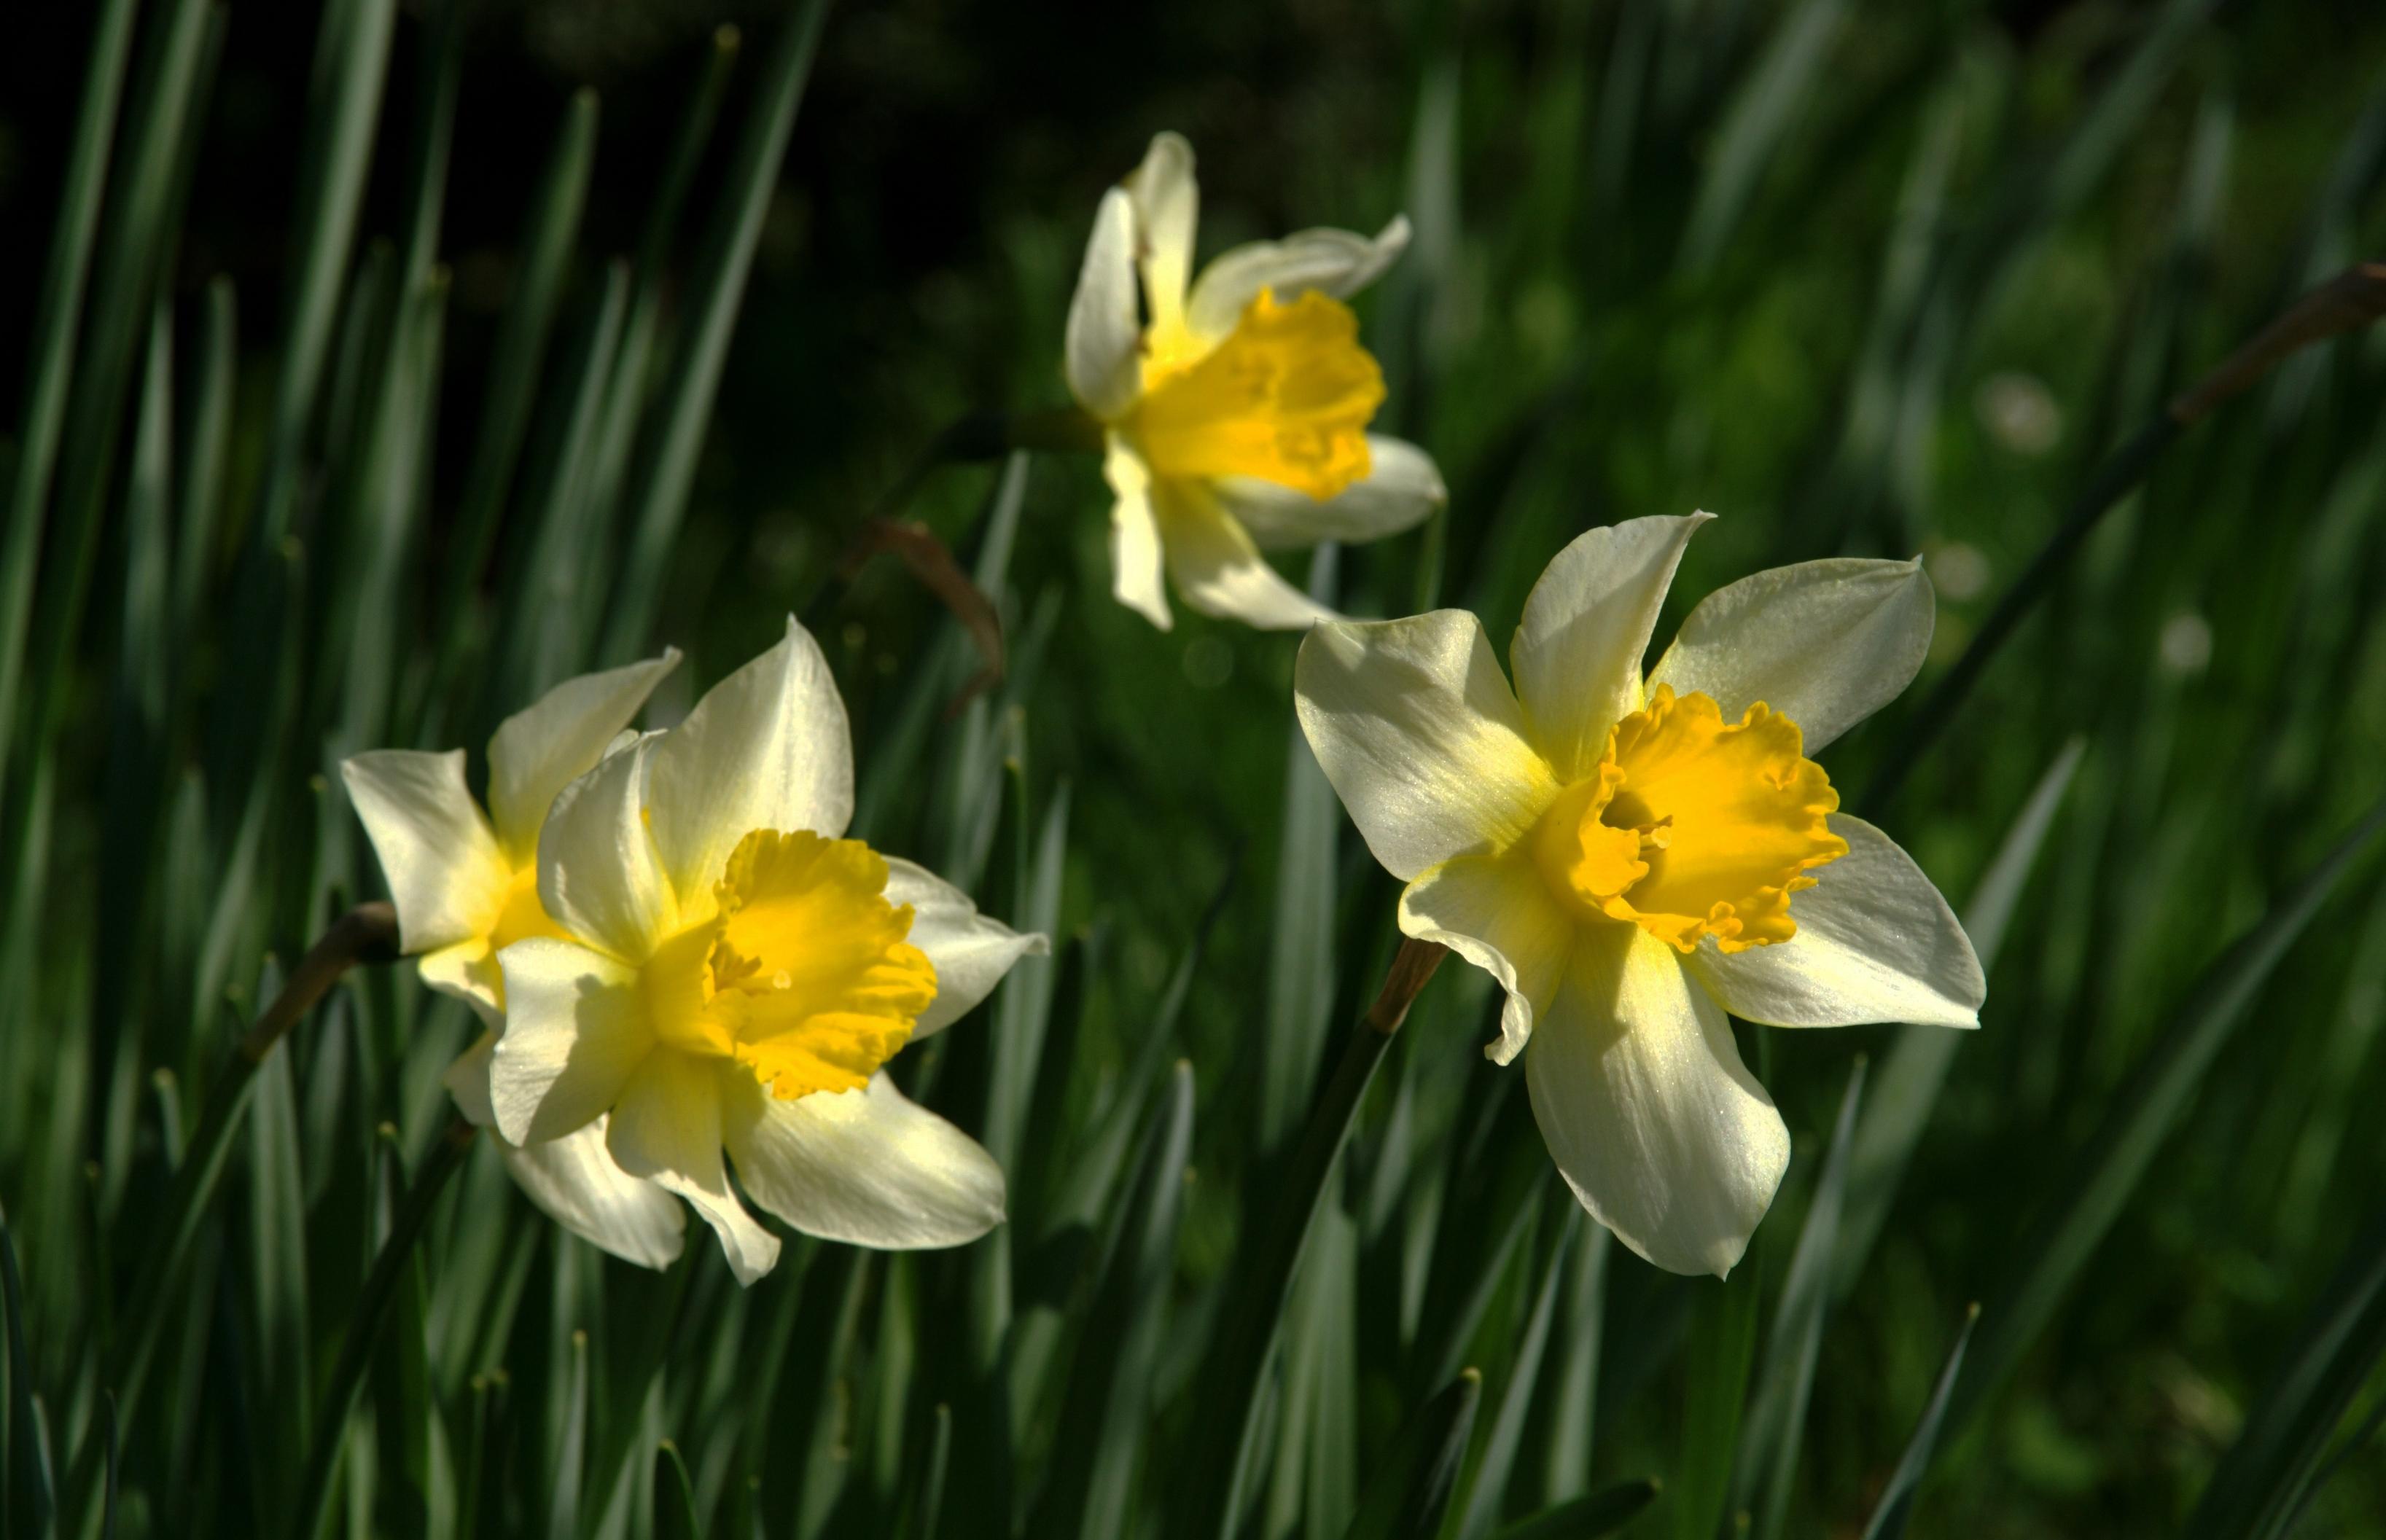 daffodils-photo-30